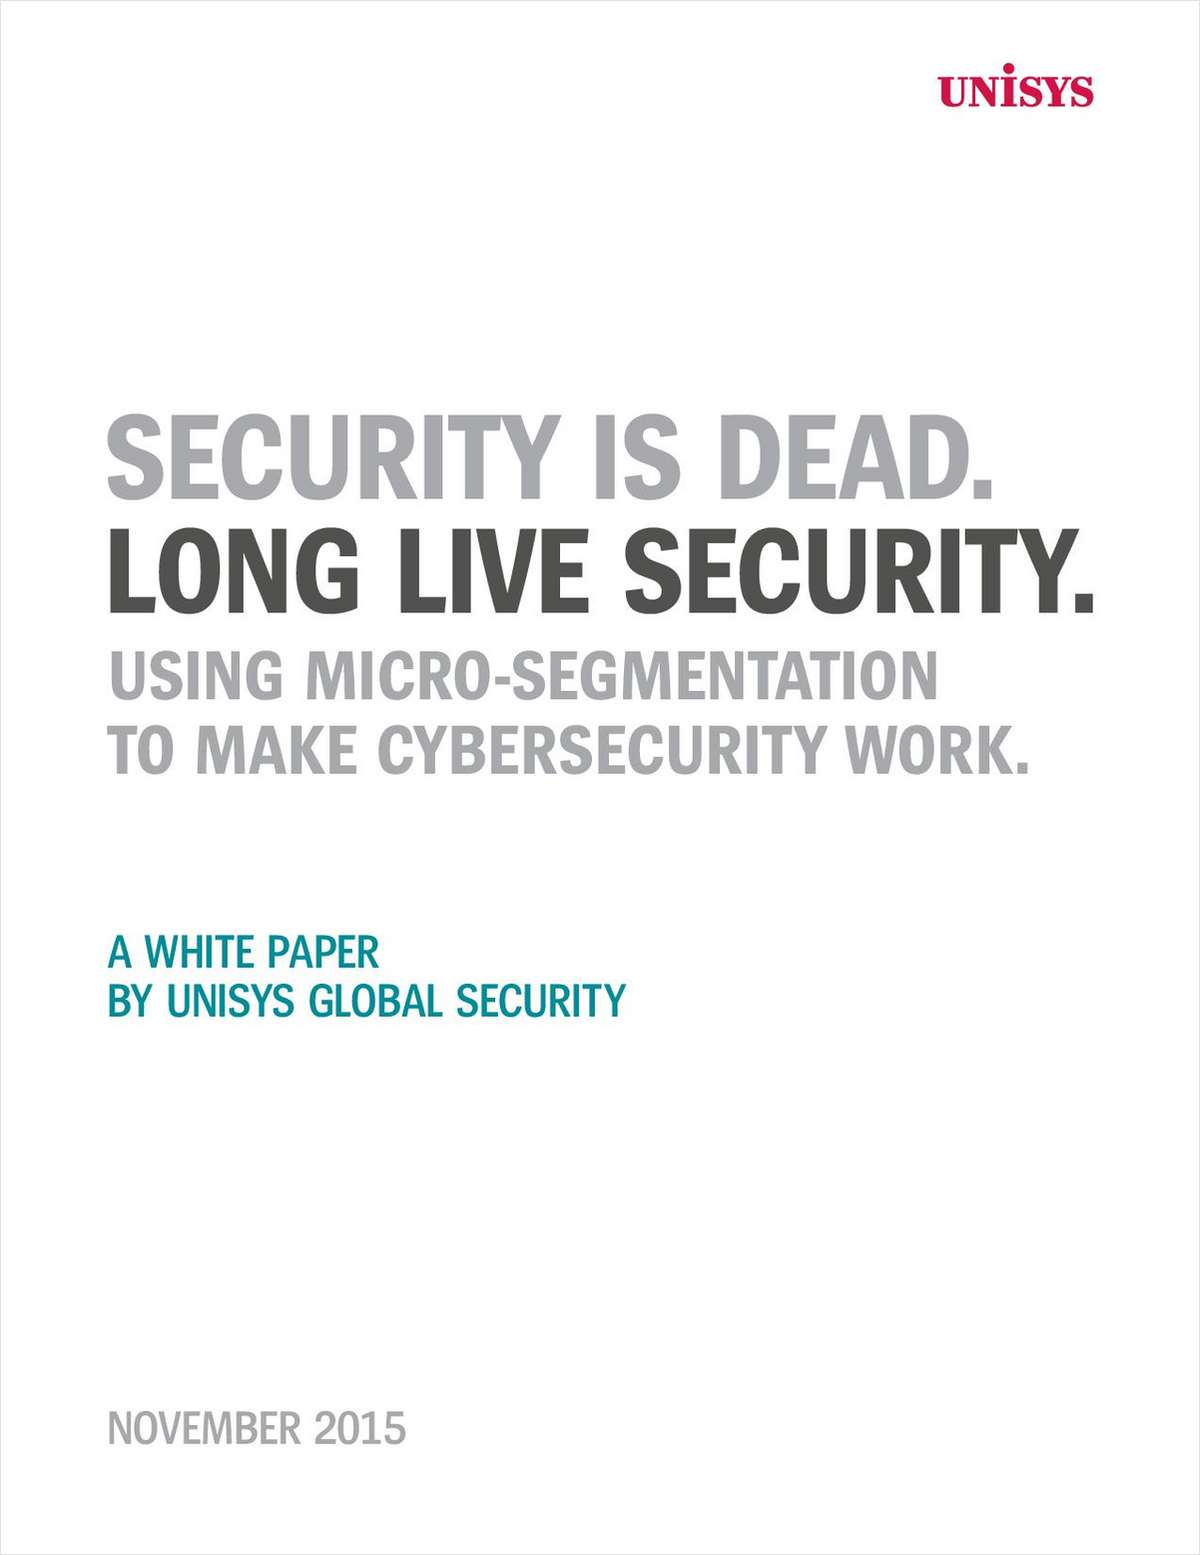 Using Micro-Segmentation to Make Cybersecurity Work